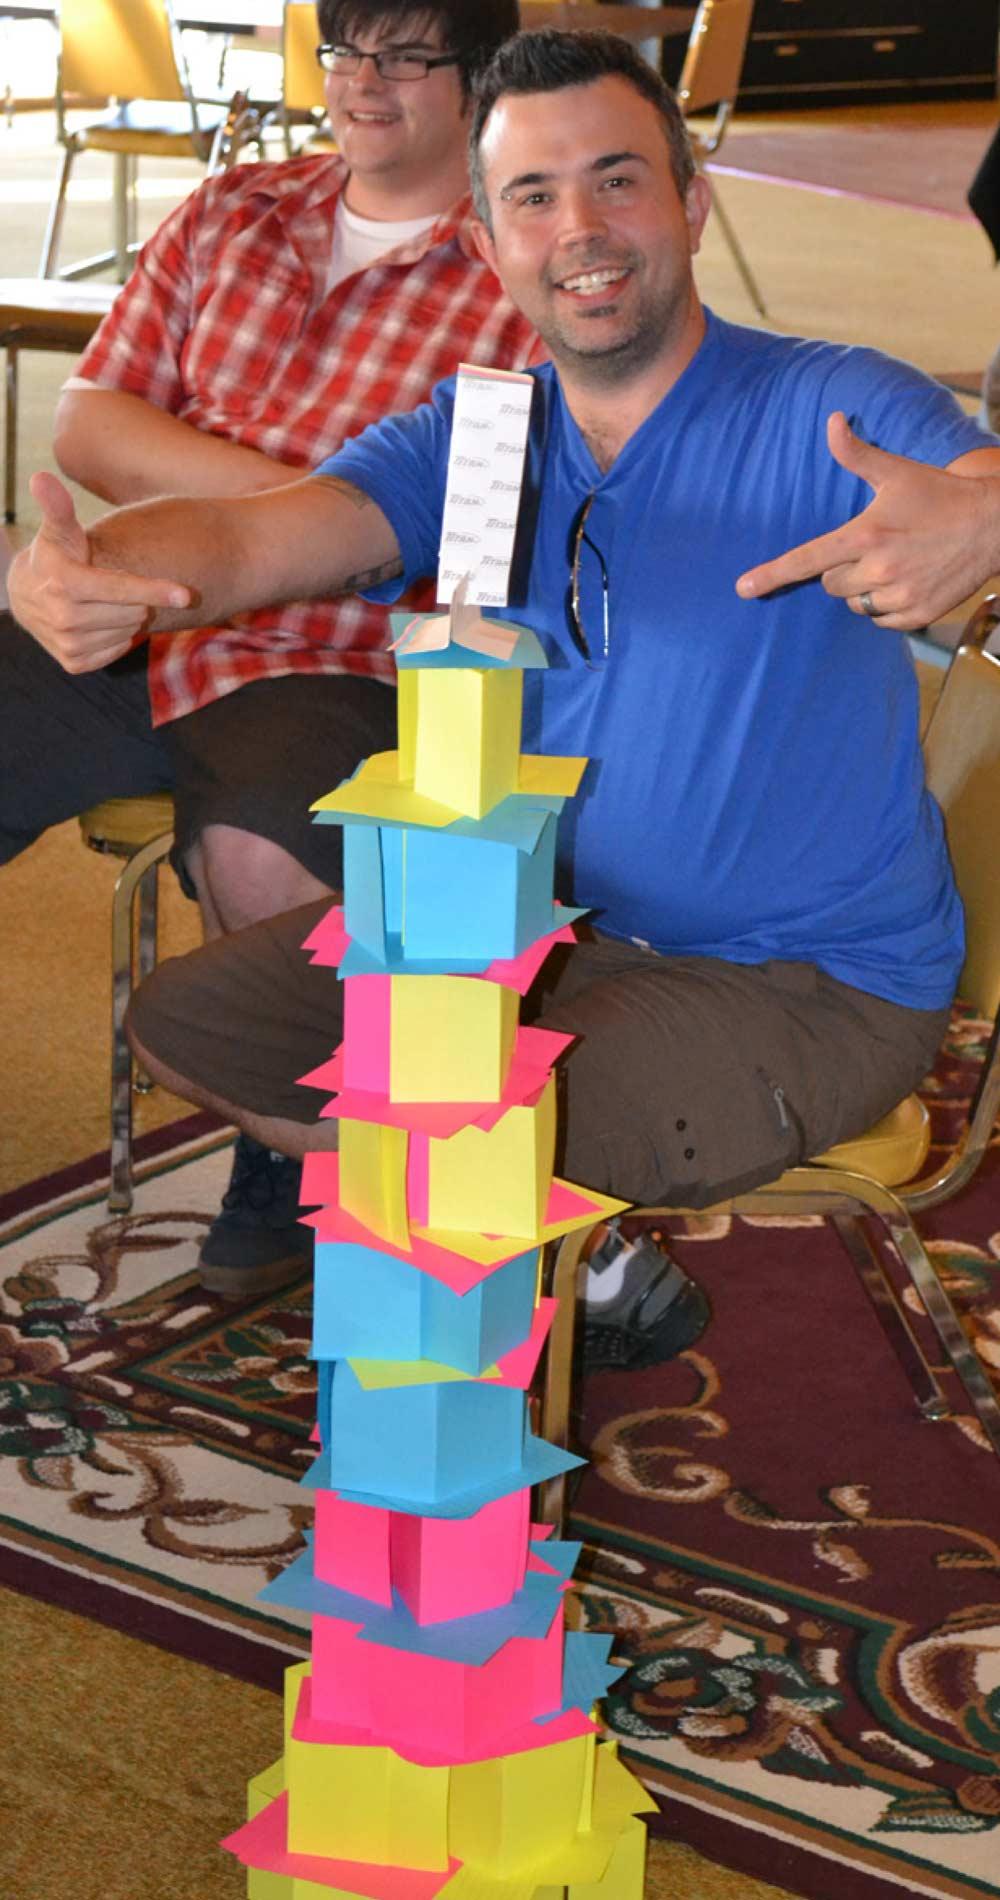 culture-photo-retreat-papertower.jpg